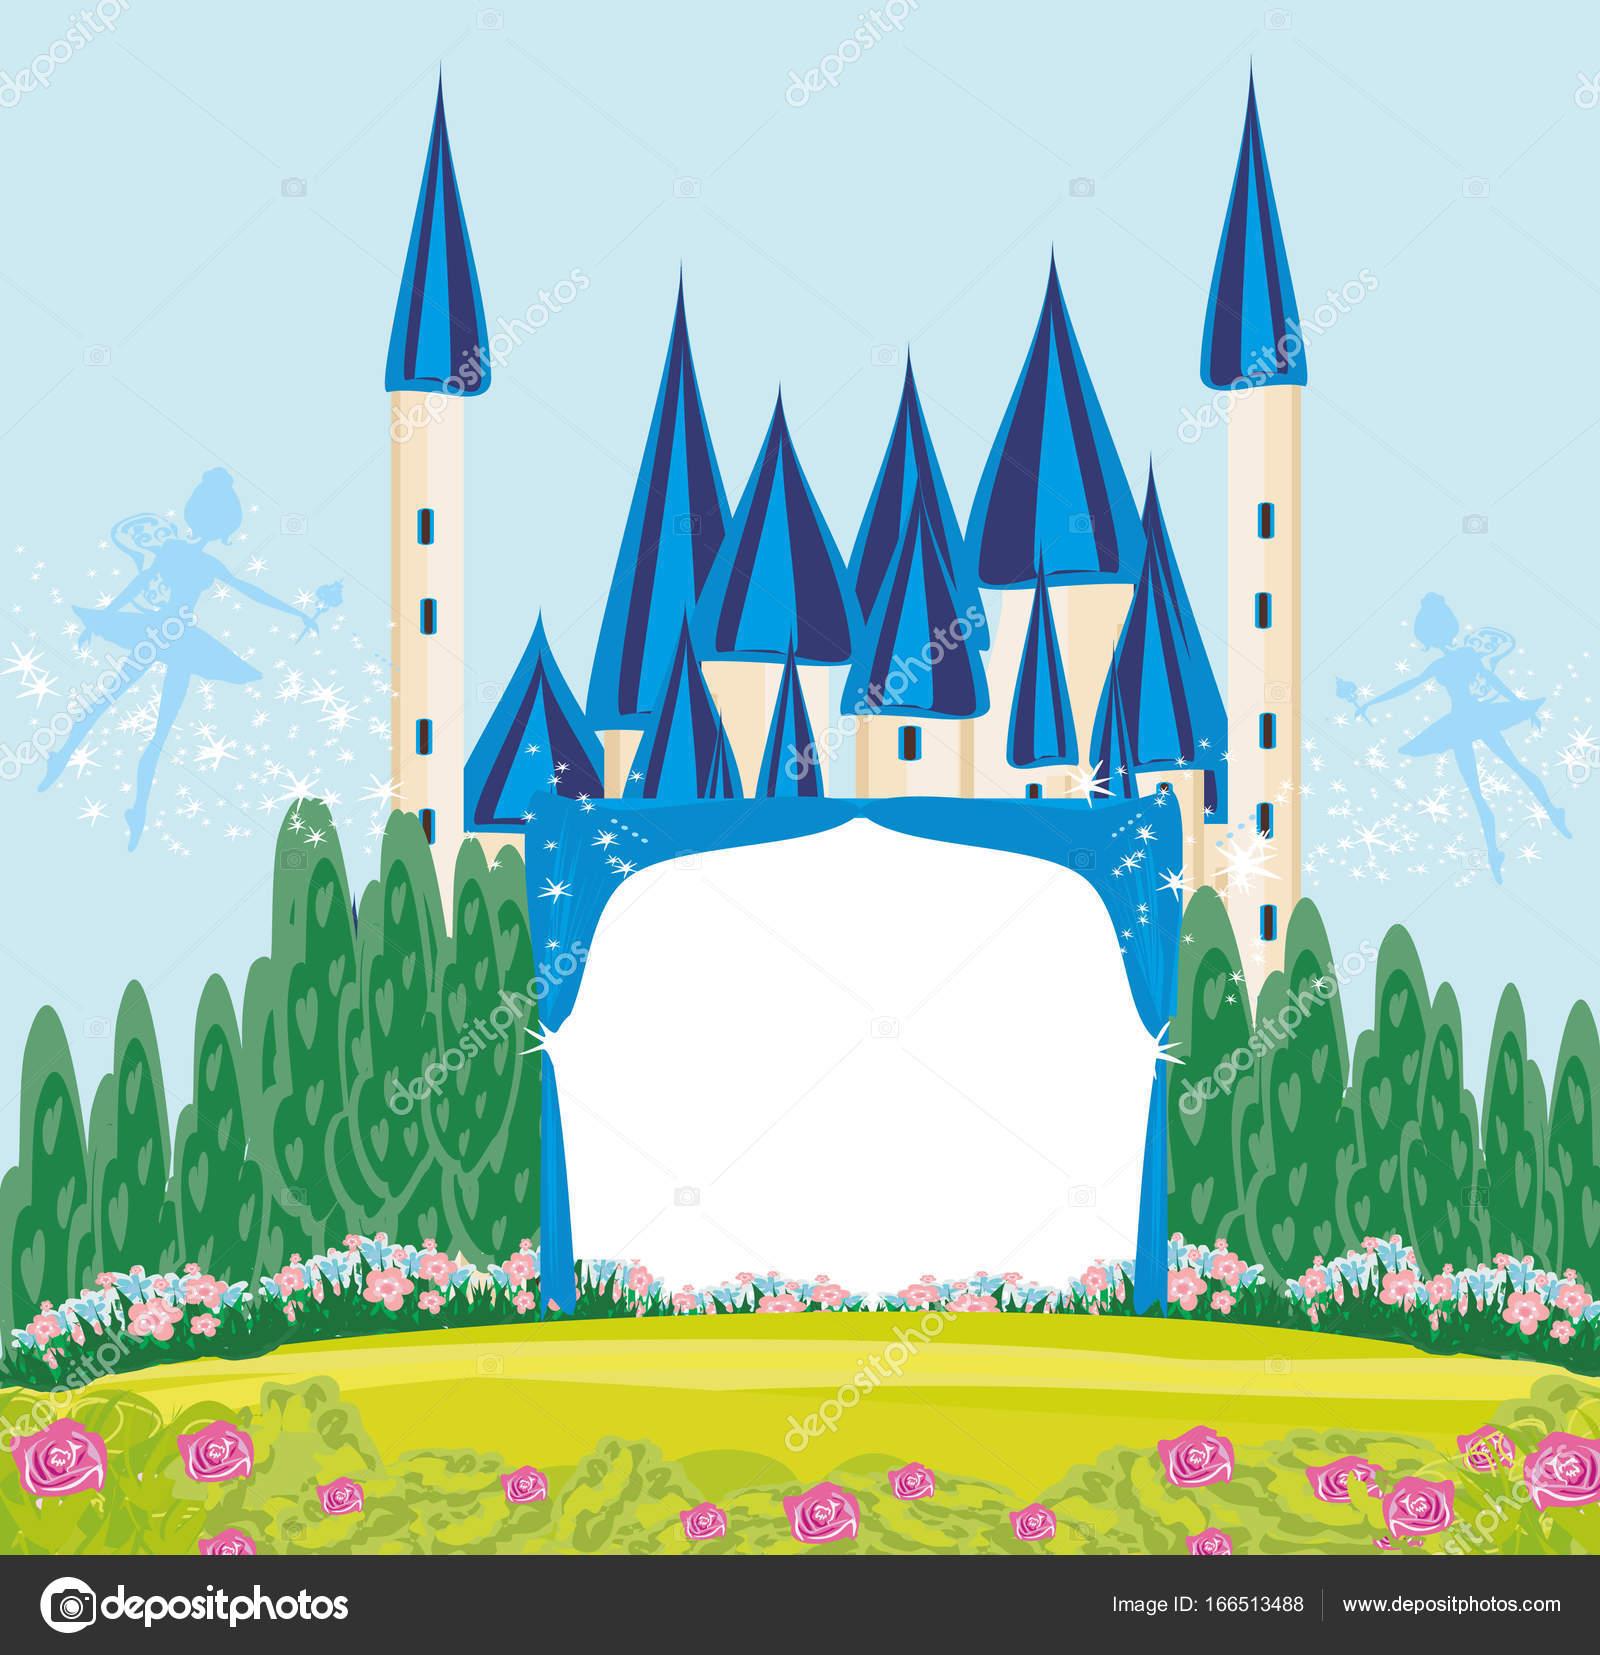 Moldura Castelo De Princesa De Conto De Fadas De Magia